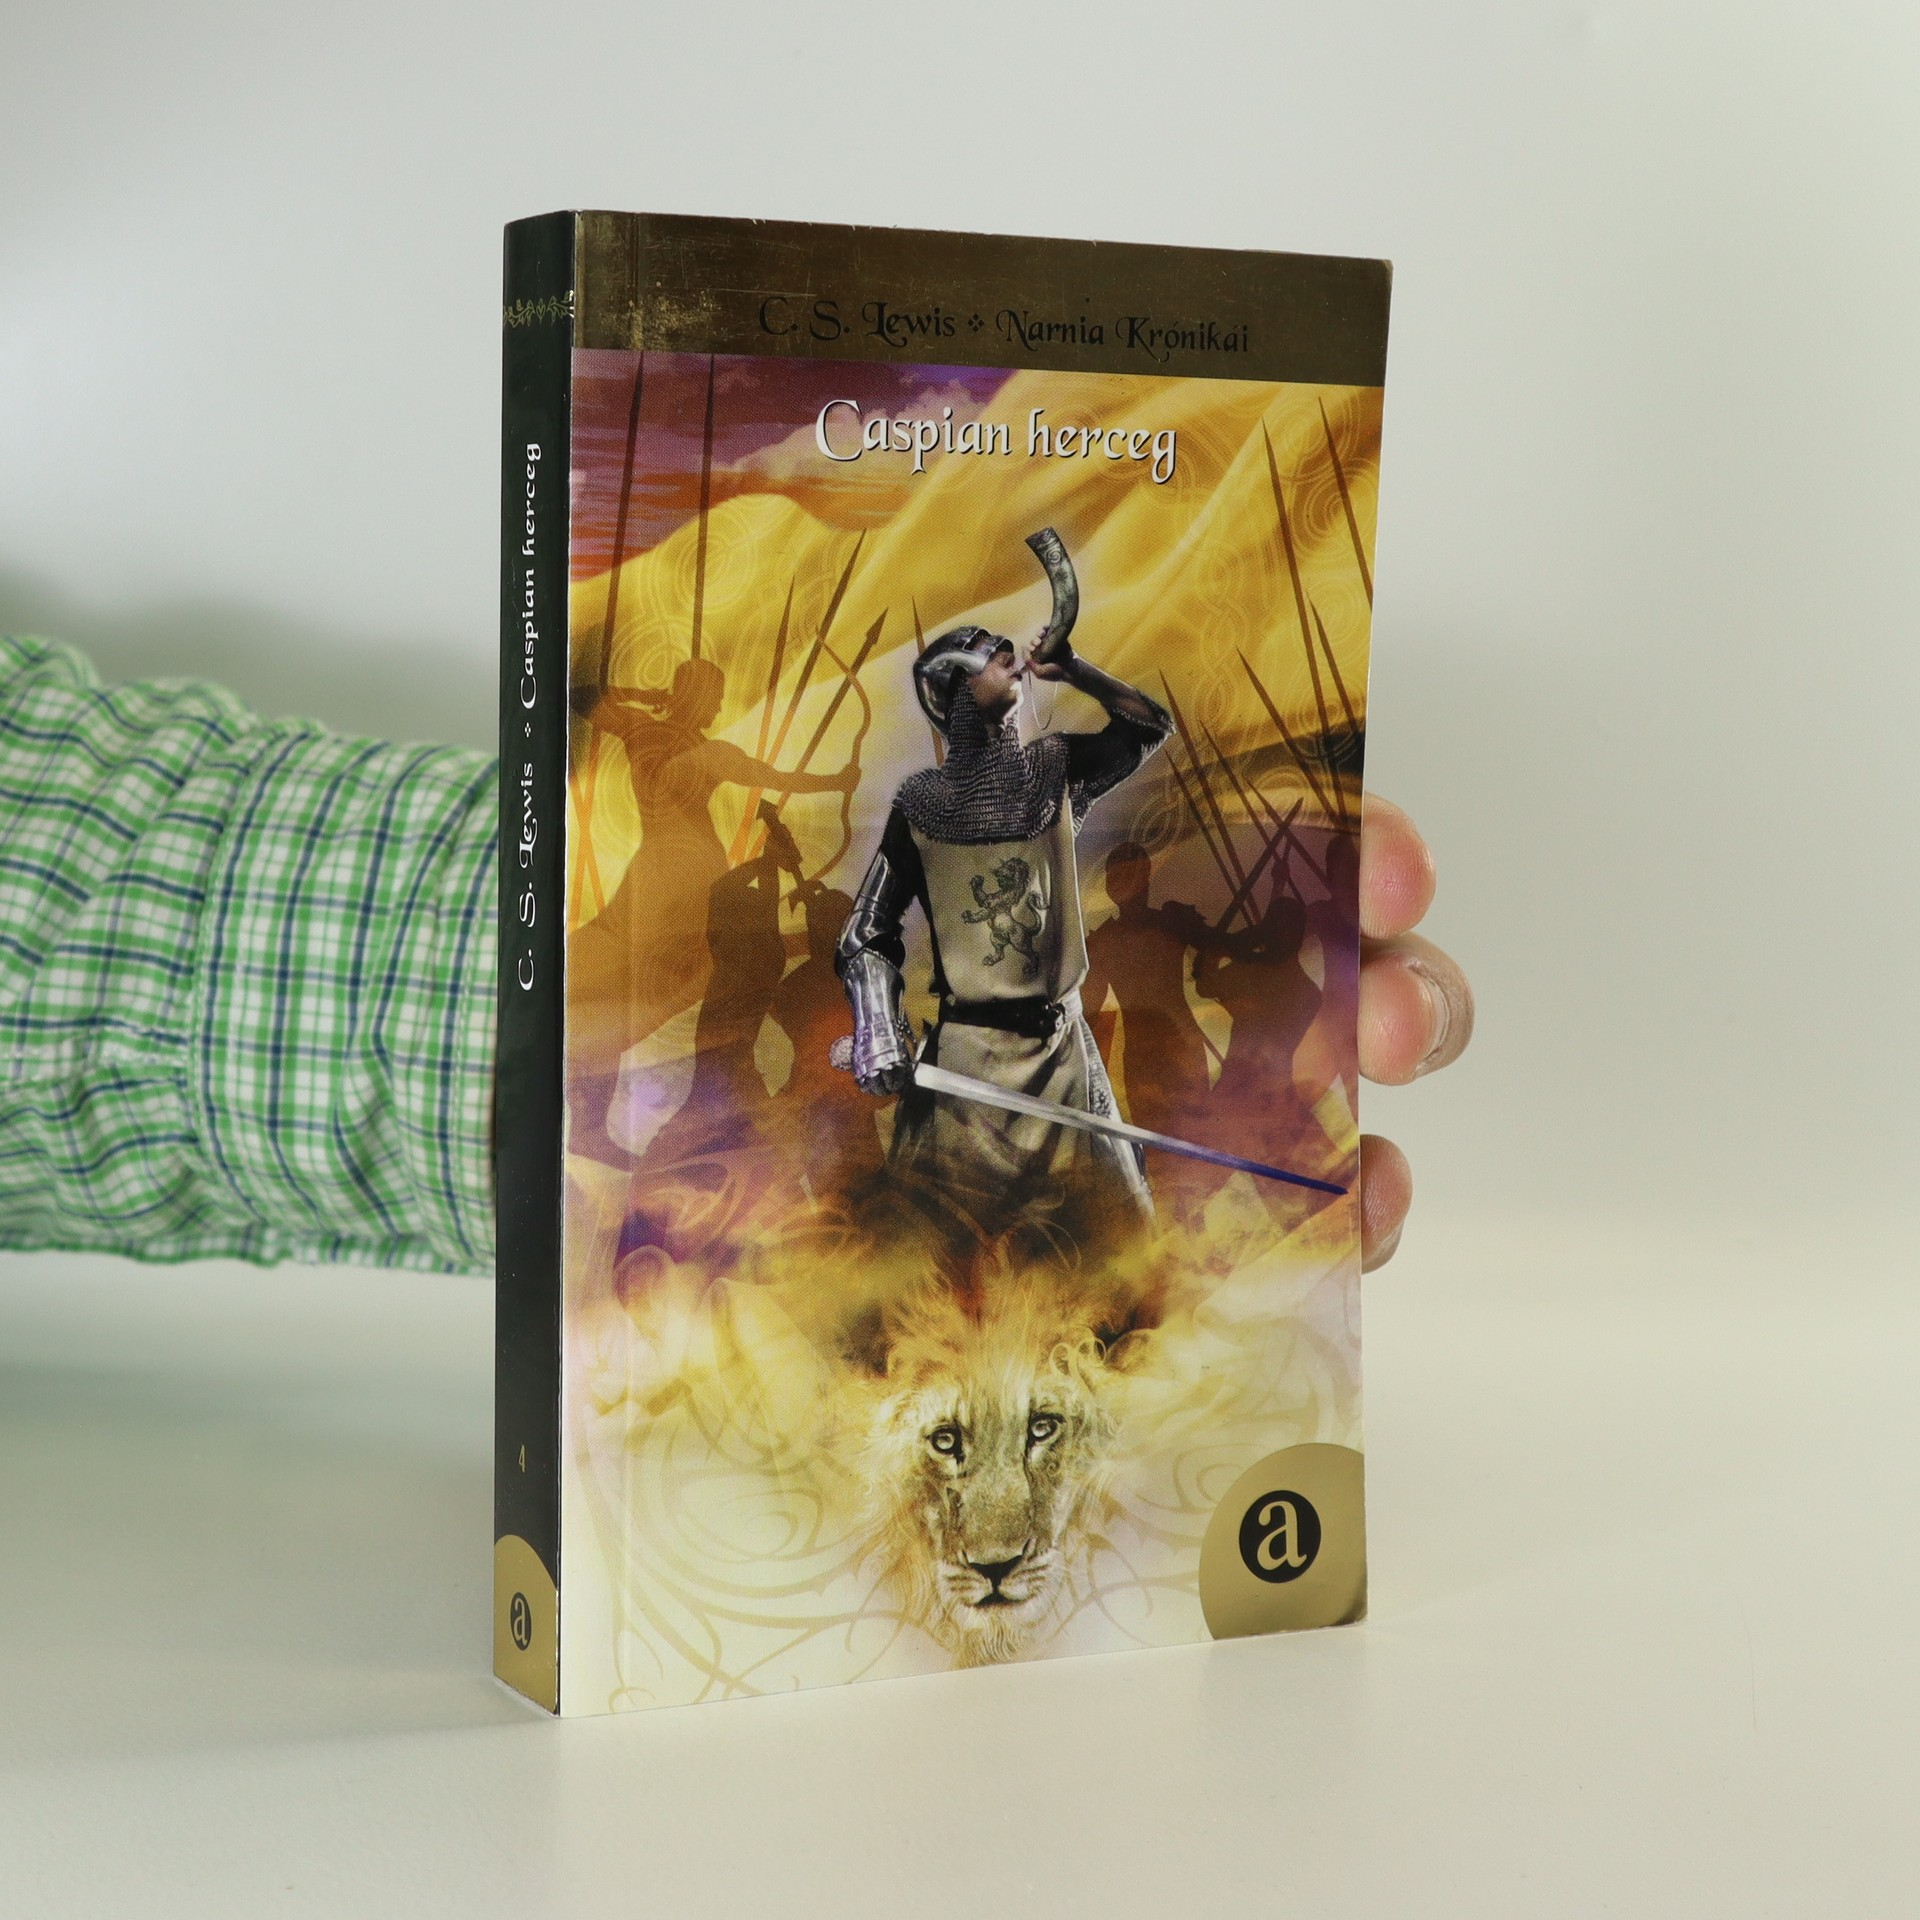 antikvární kniha Caspian herceg, neuveden